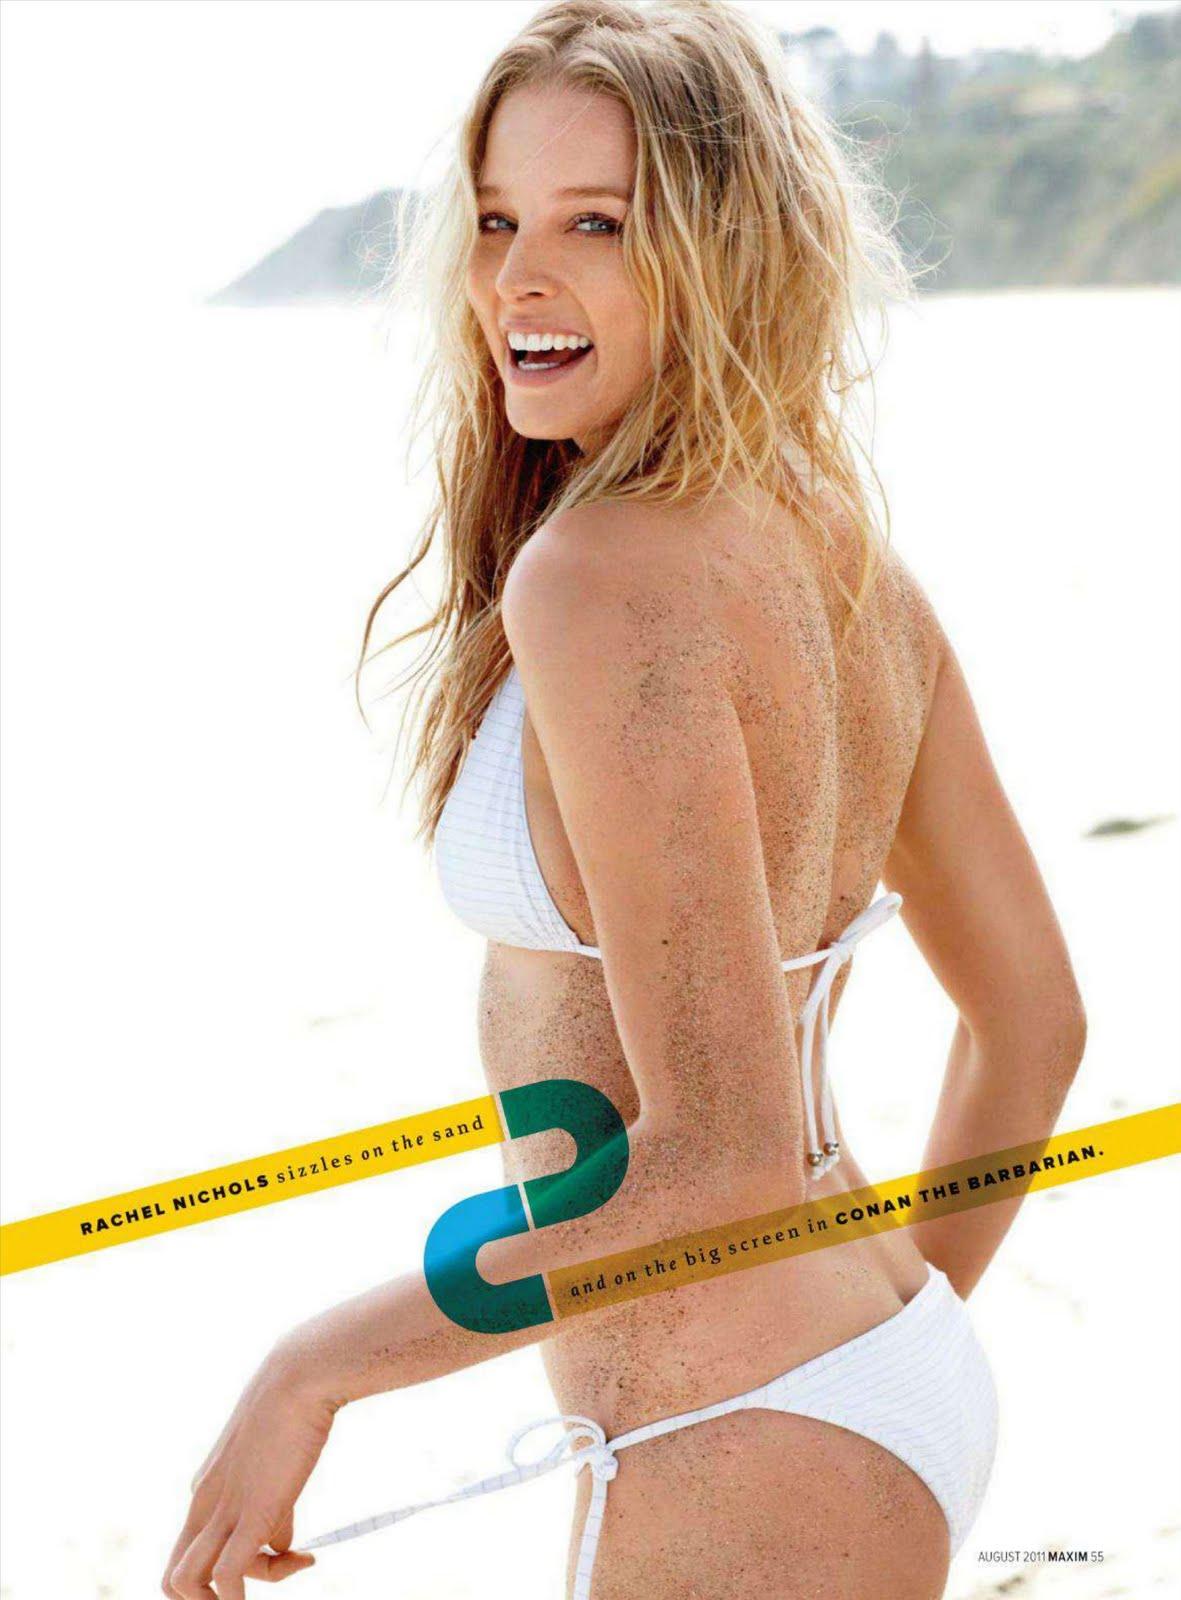 http://1.bp.blogspot.com/-UtMEQtnbPJI/ThWbSCy4tkI/AAAAAAAAKPA/7DUBYwxovRI/s1600/Rachel+Nichols+-+Maxim+August+2011+%25284%2529.jpg